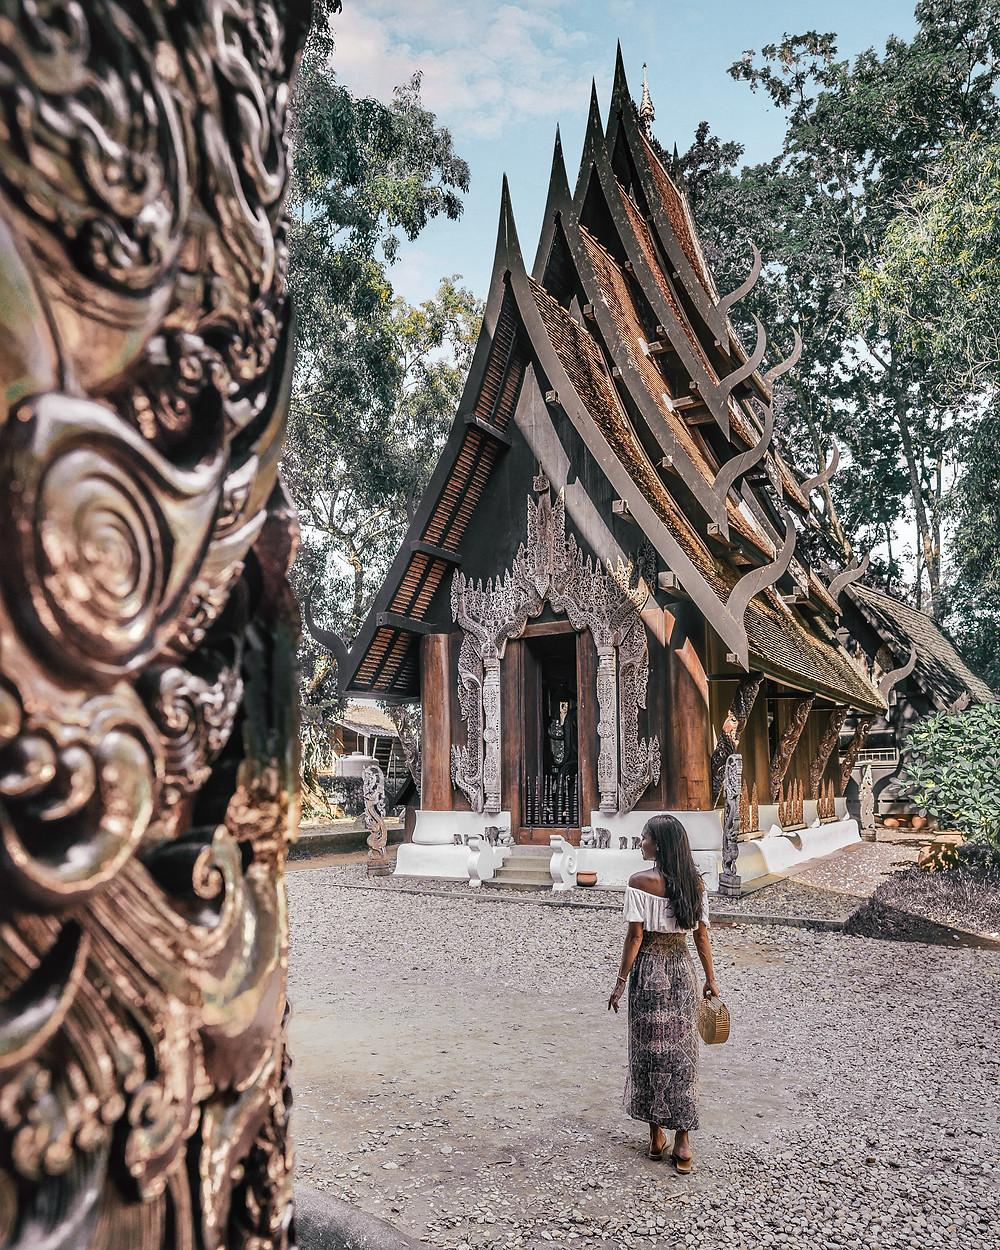 Baan Dam, House of Black and White, Chiang Rai, Thailand